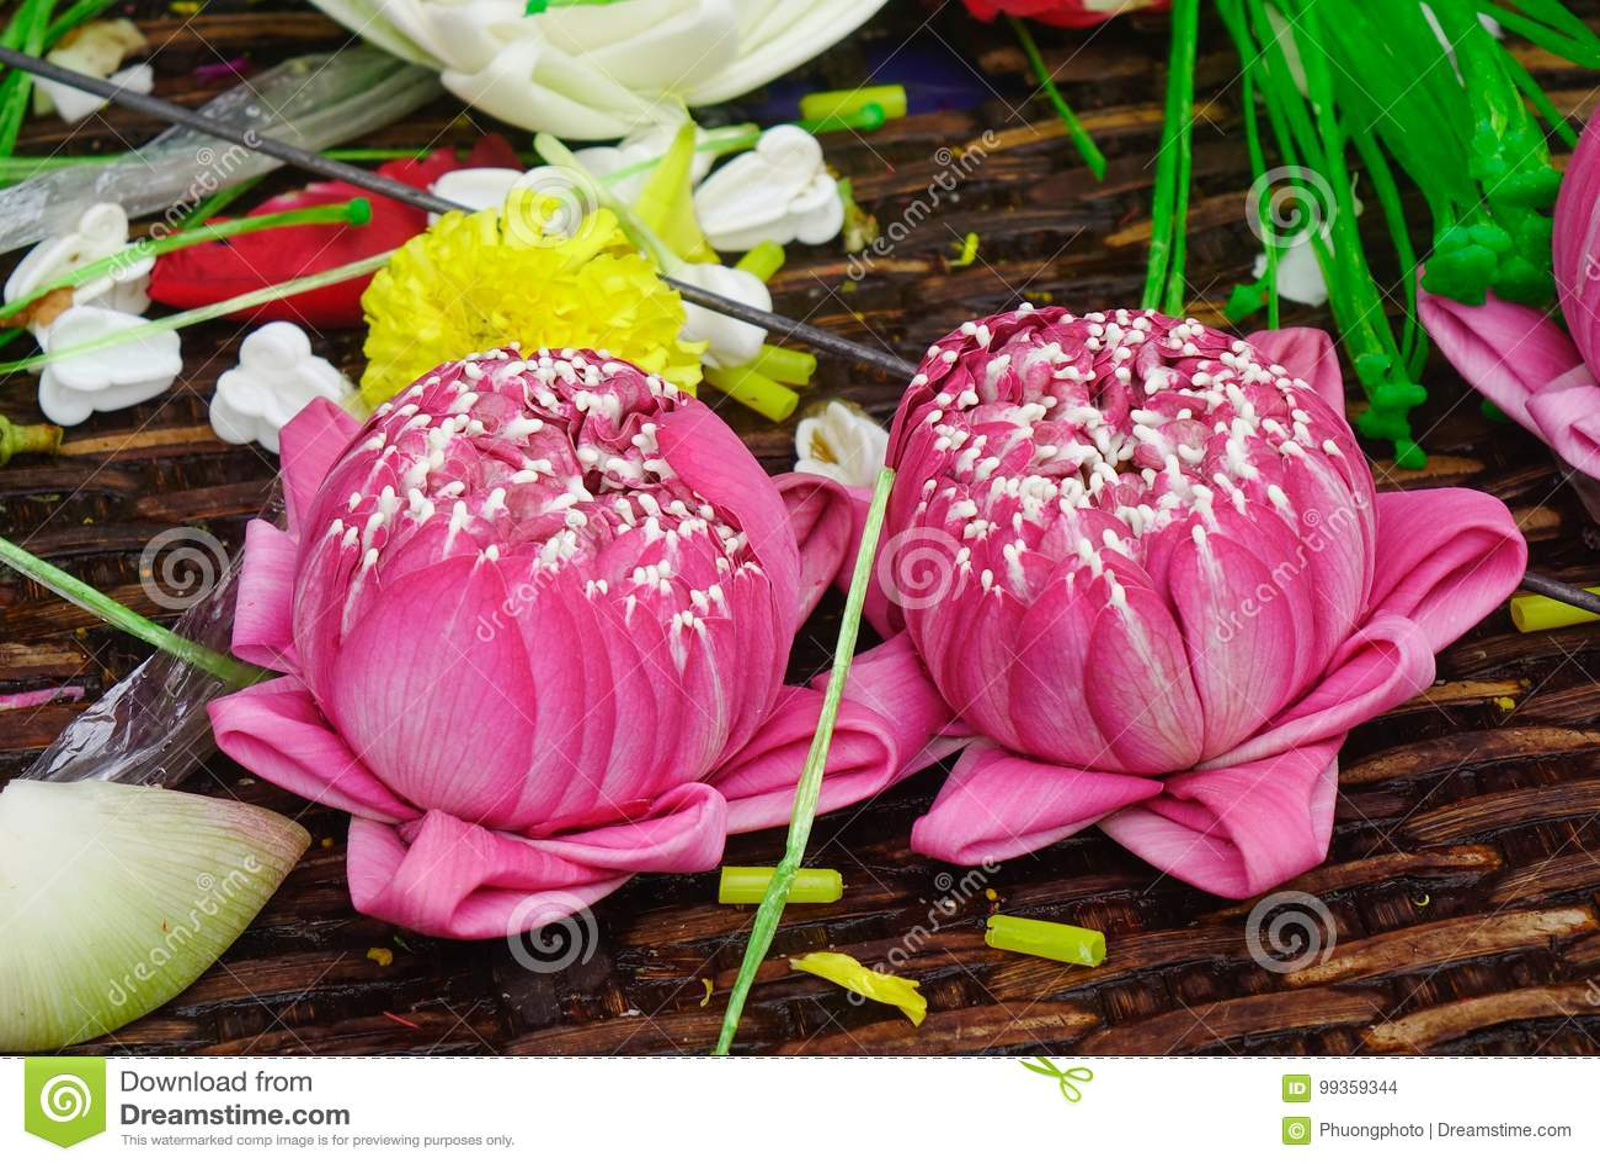 Praying flowers for sale at hindu temple stock photo image of lotus flowers for sale at hindu temple in bangkok thailand izmirmasajfo